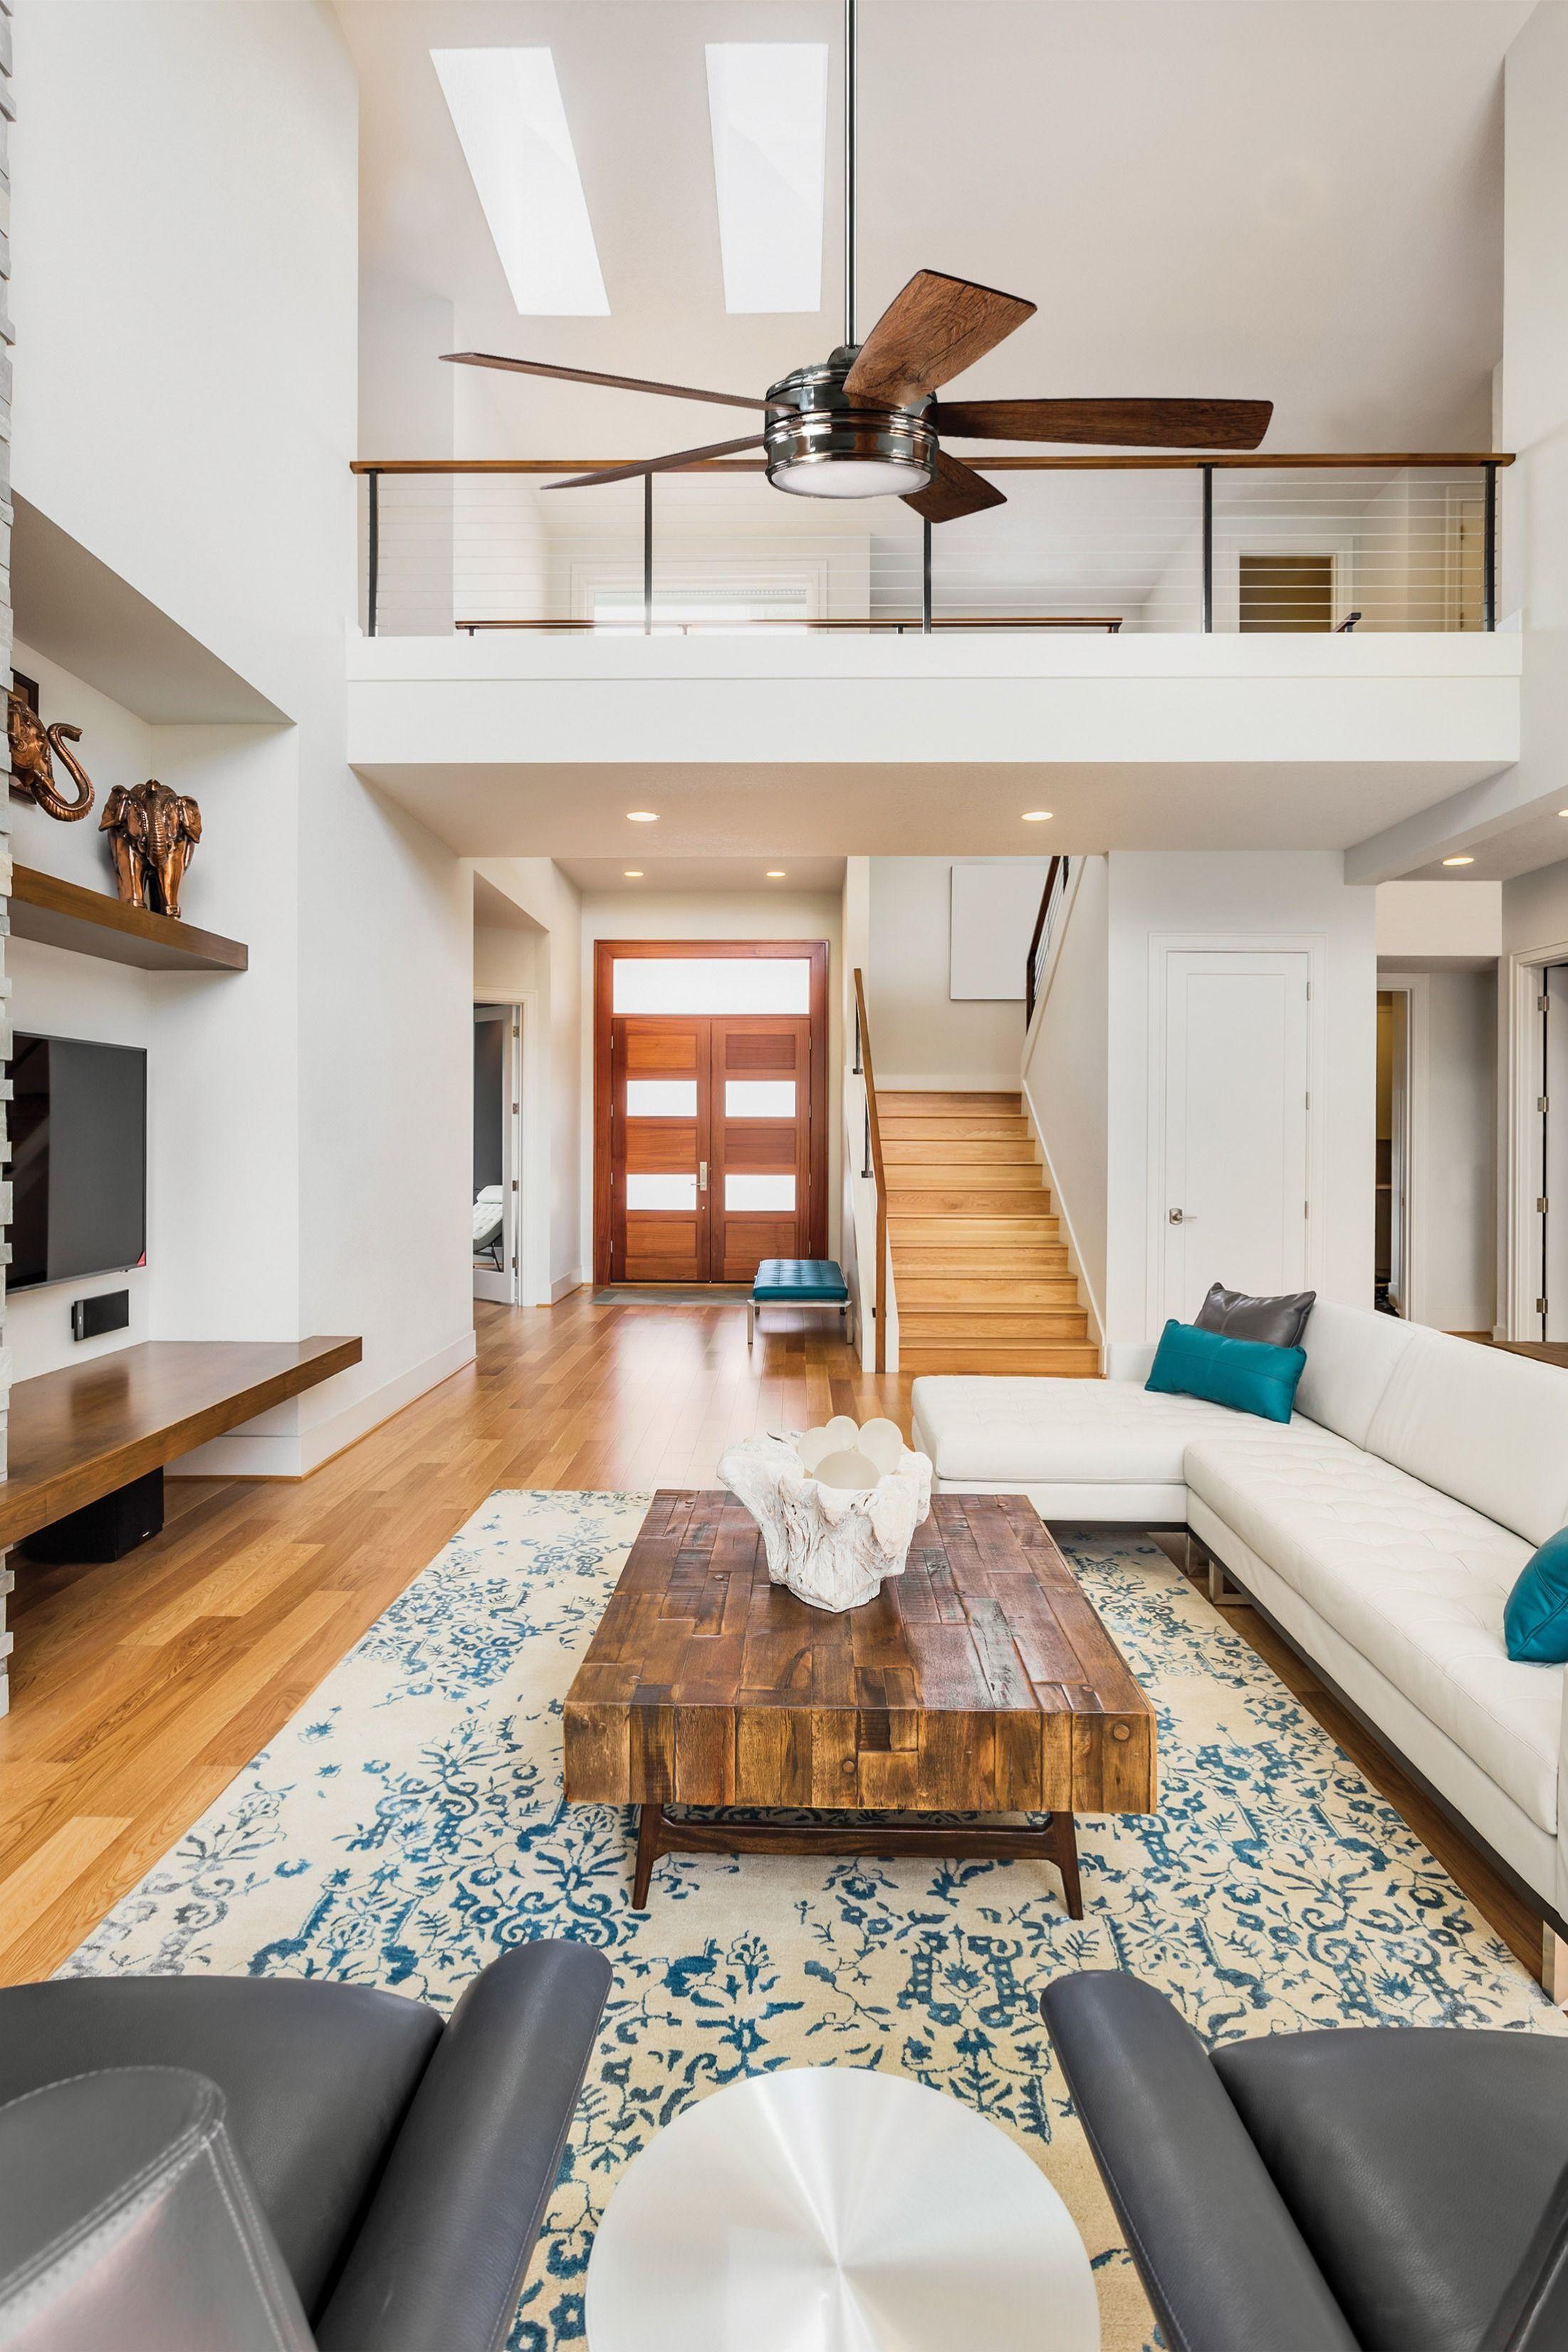 Ceiling Fan With Led Light High Ceiling Living Room Stylish Bedroom Design Interior Design Living Room